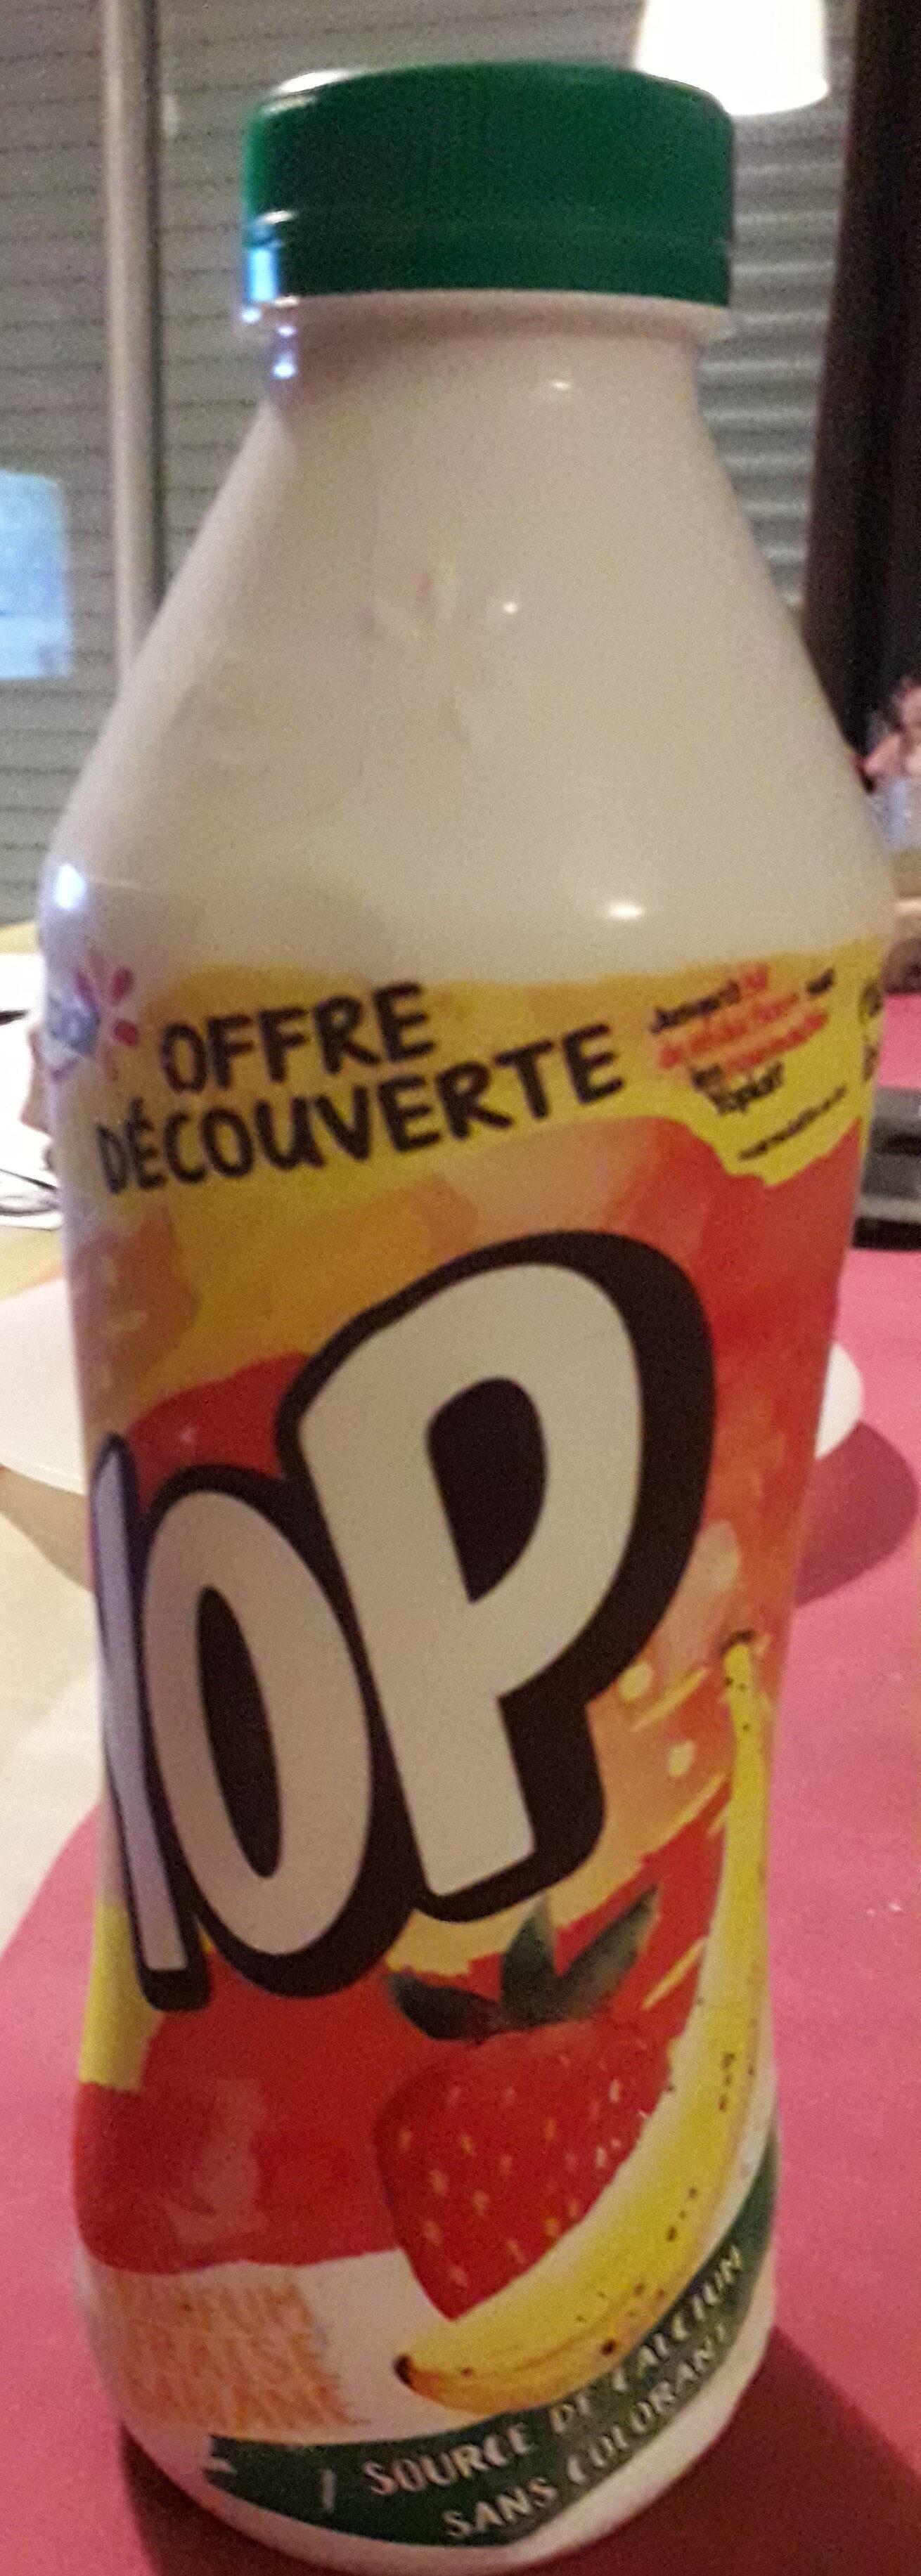 Yop Fraise Banane - Product - fr